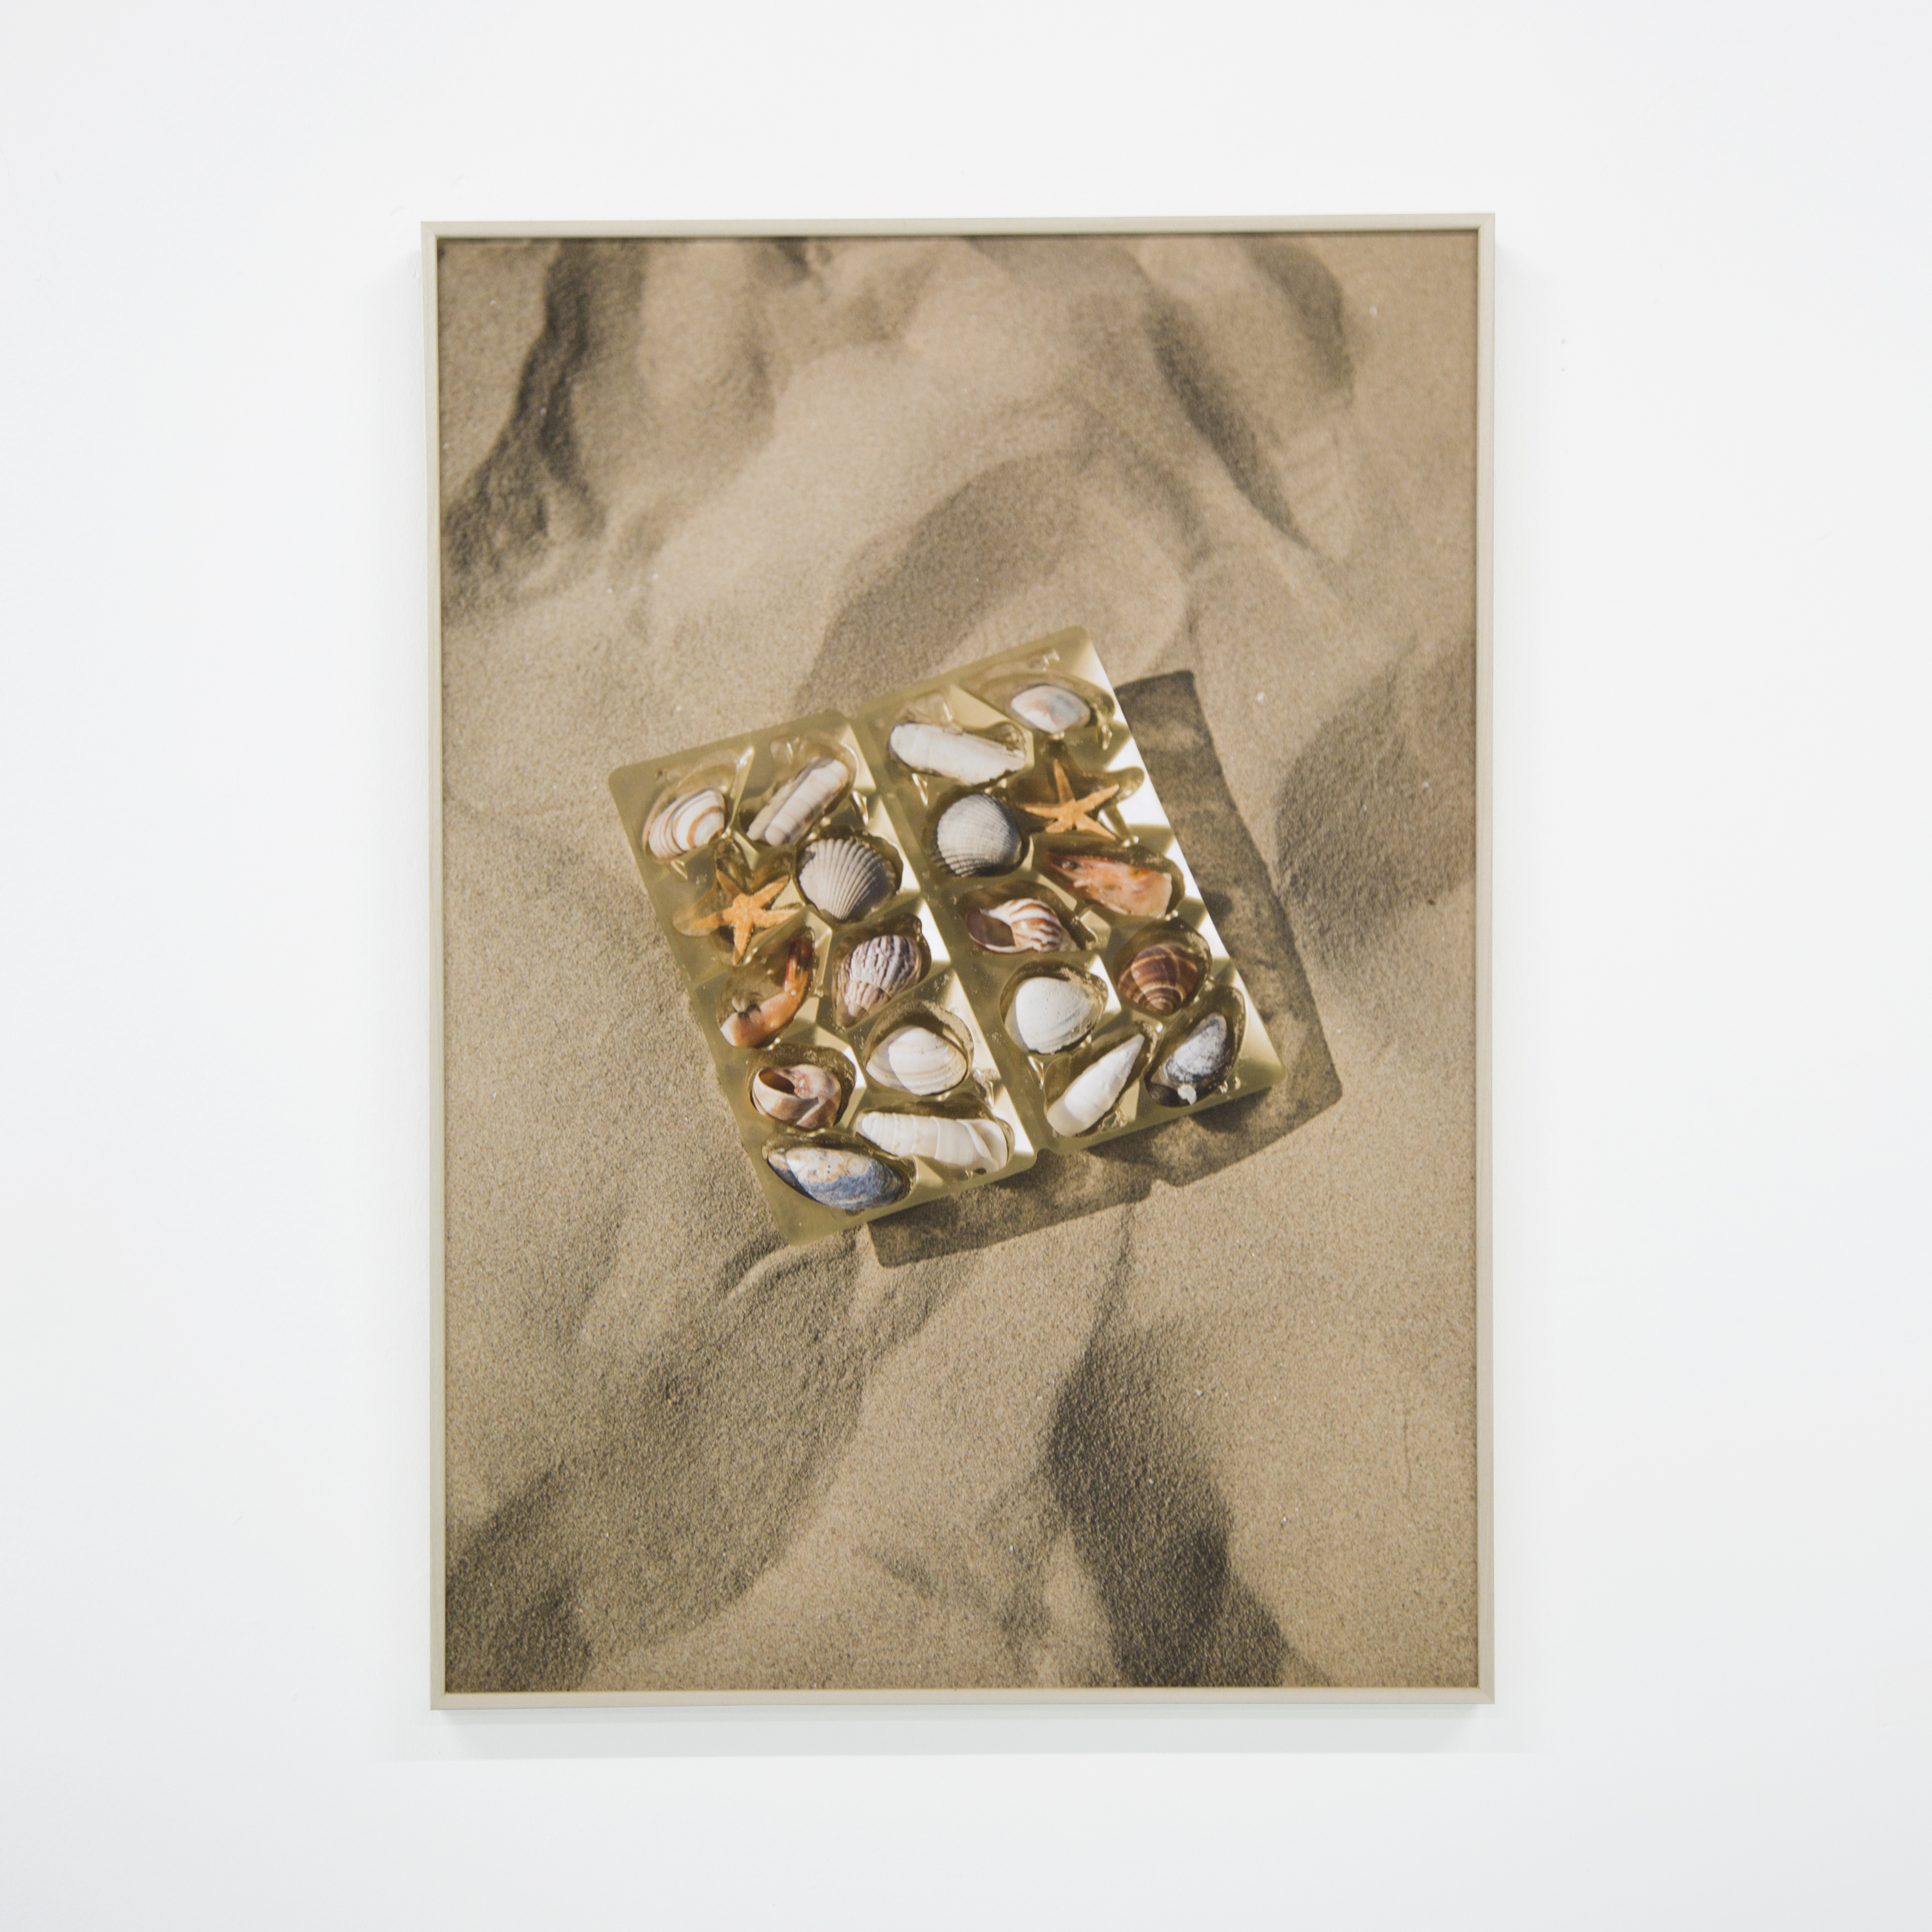 Willem de Haan, Sea Fruit Chocolates Framed 1